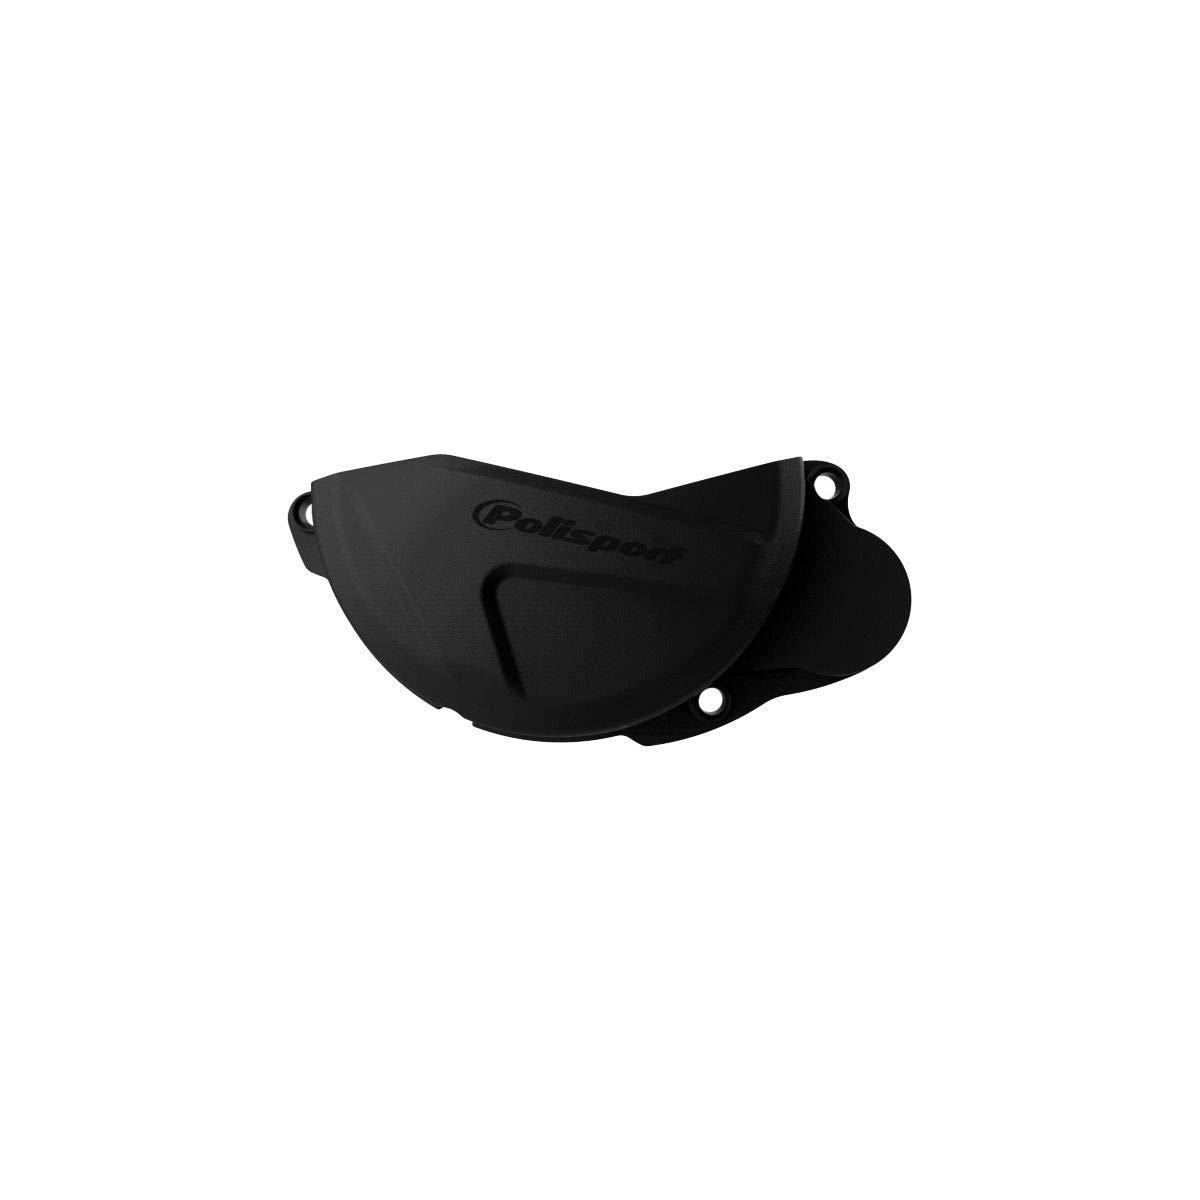 Polisport Clutch Cover Guard Black for 10-16 Honda CRF450R